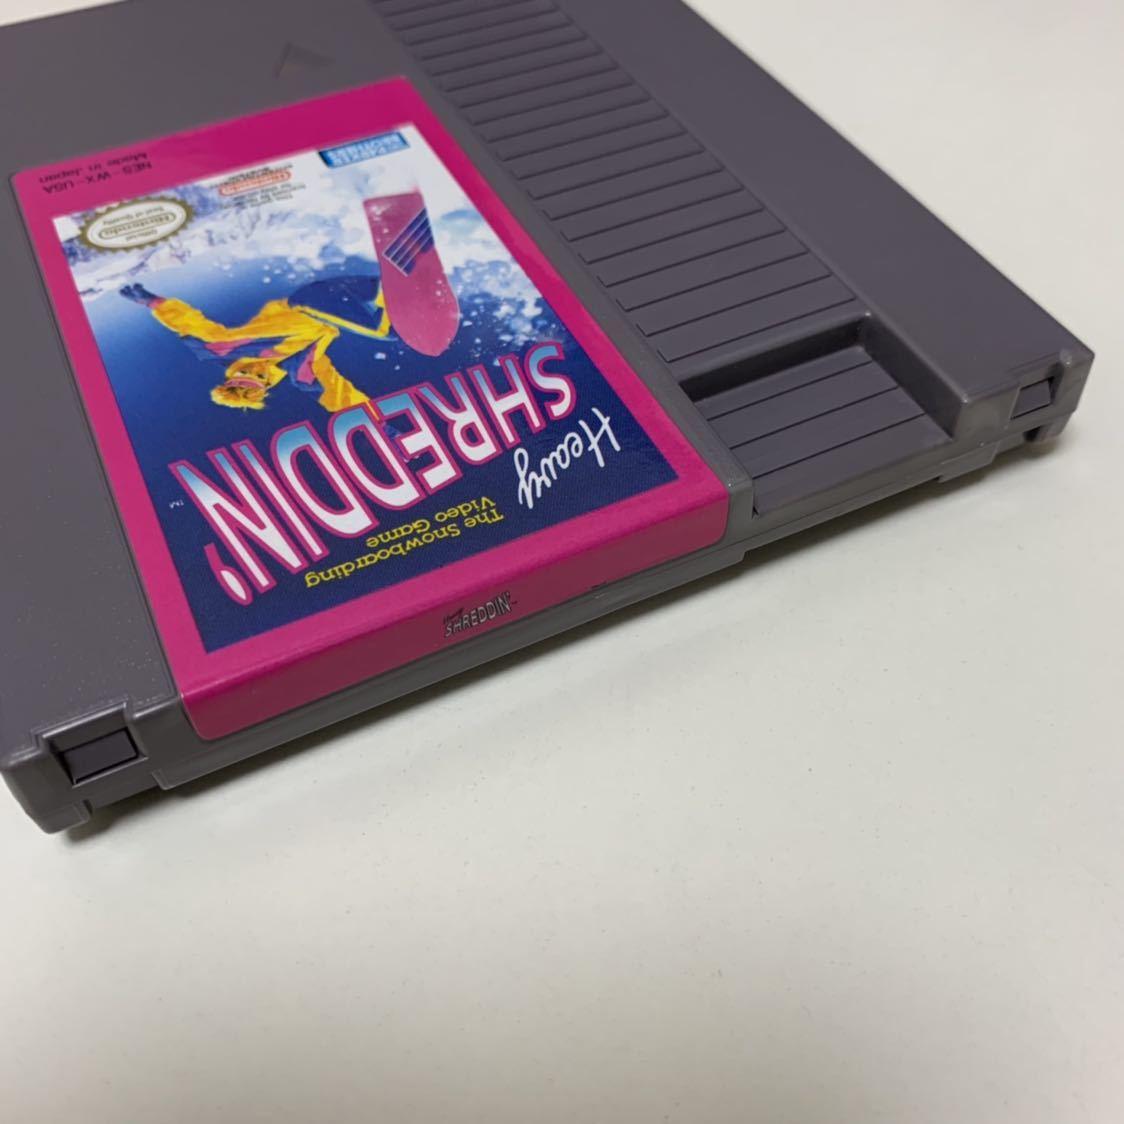 NES 海外 北米版ファミコン 「Heavy SHREDDIN'」 日本未発売 送料185円_画像4